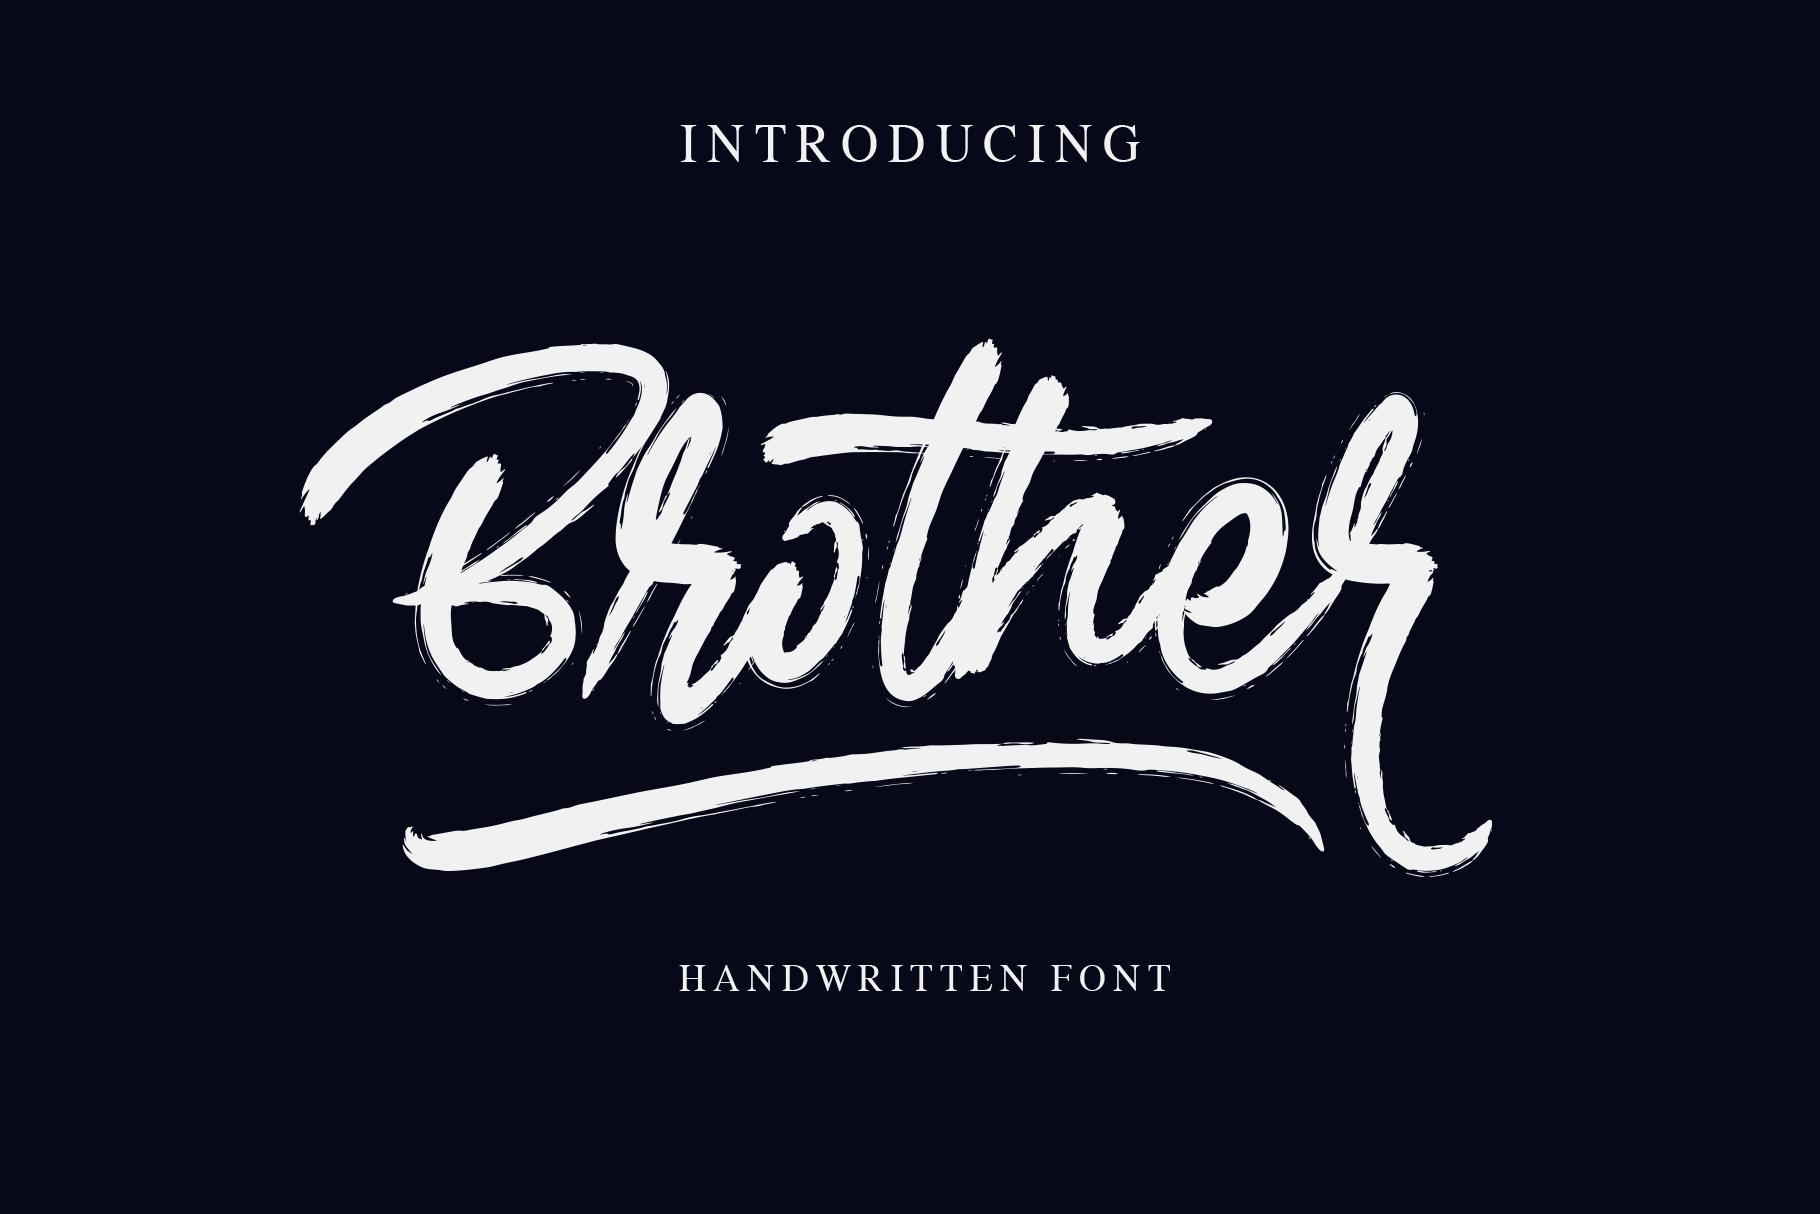 https://fontclarity.com/wp-content/uploads/2019/09/brother-brush-font-download-0.png Free Download